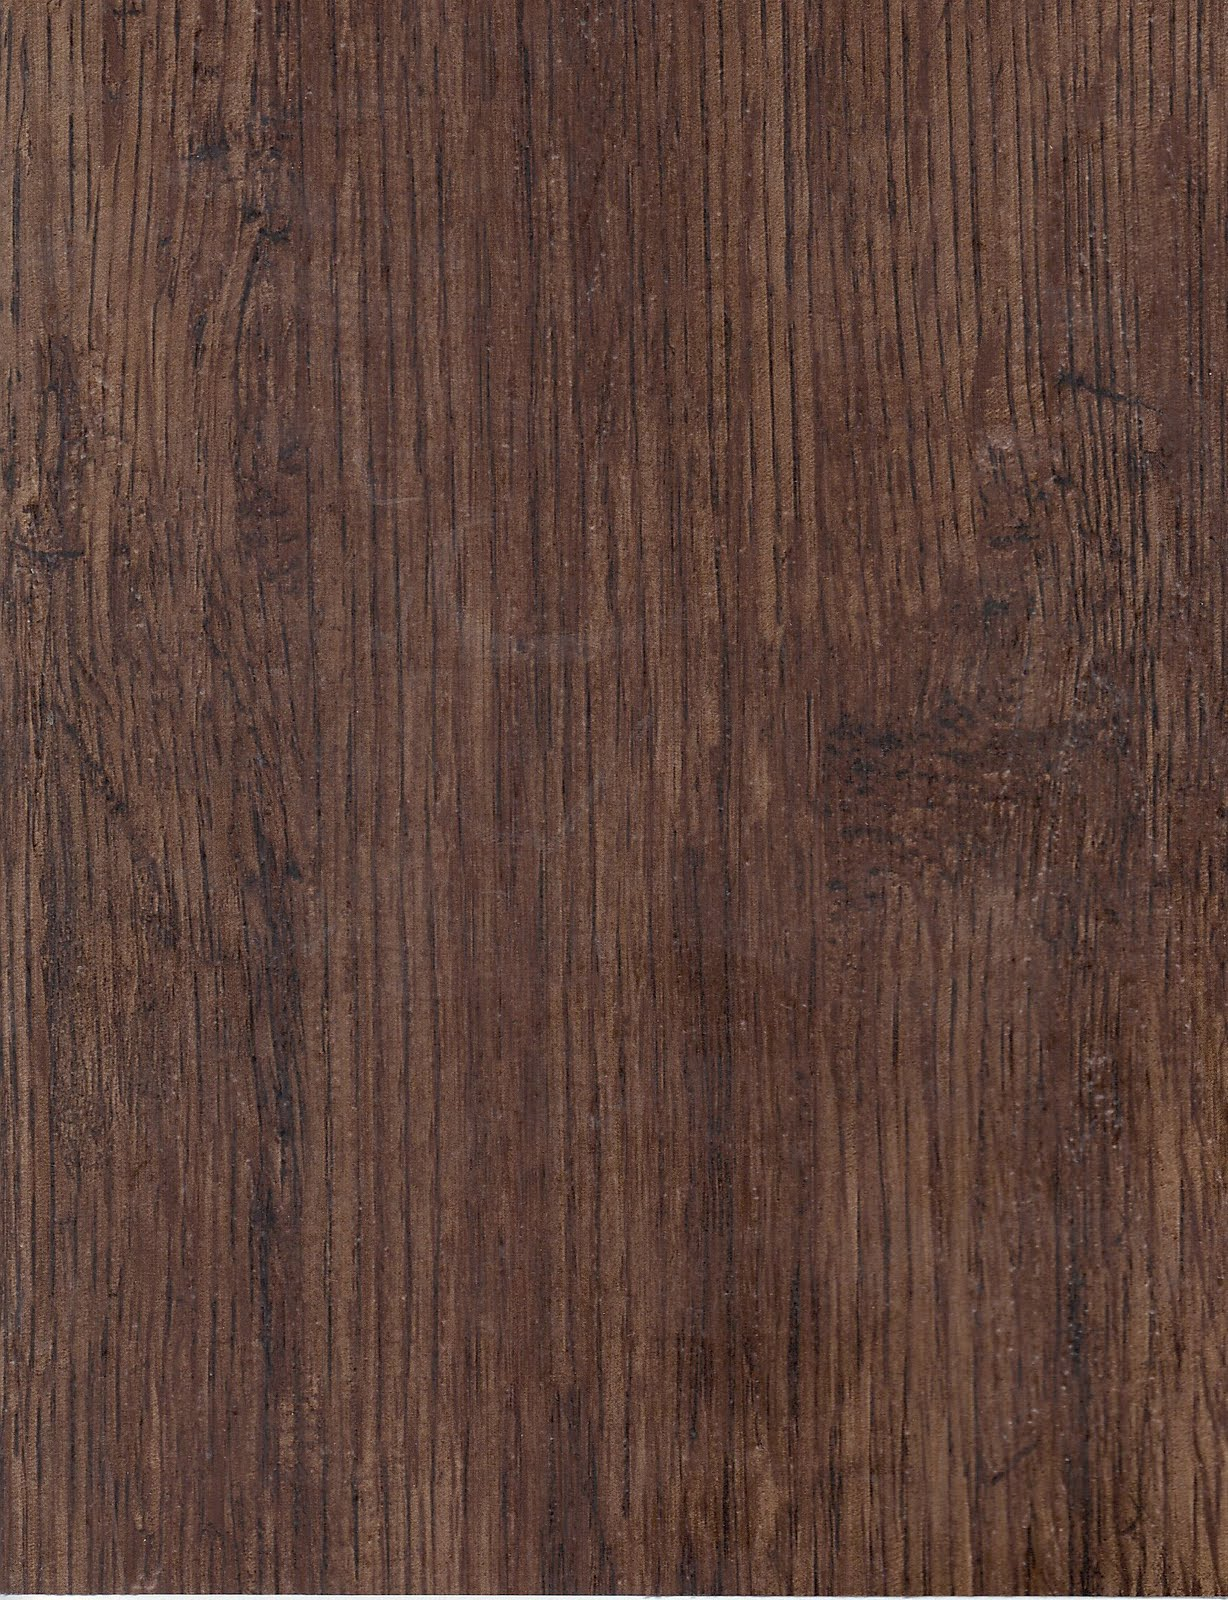 Wood Flooring Online: Vinyl Plank Flooring